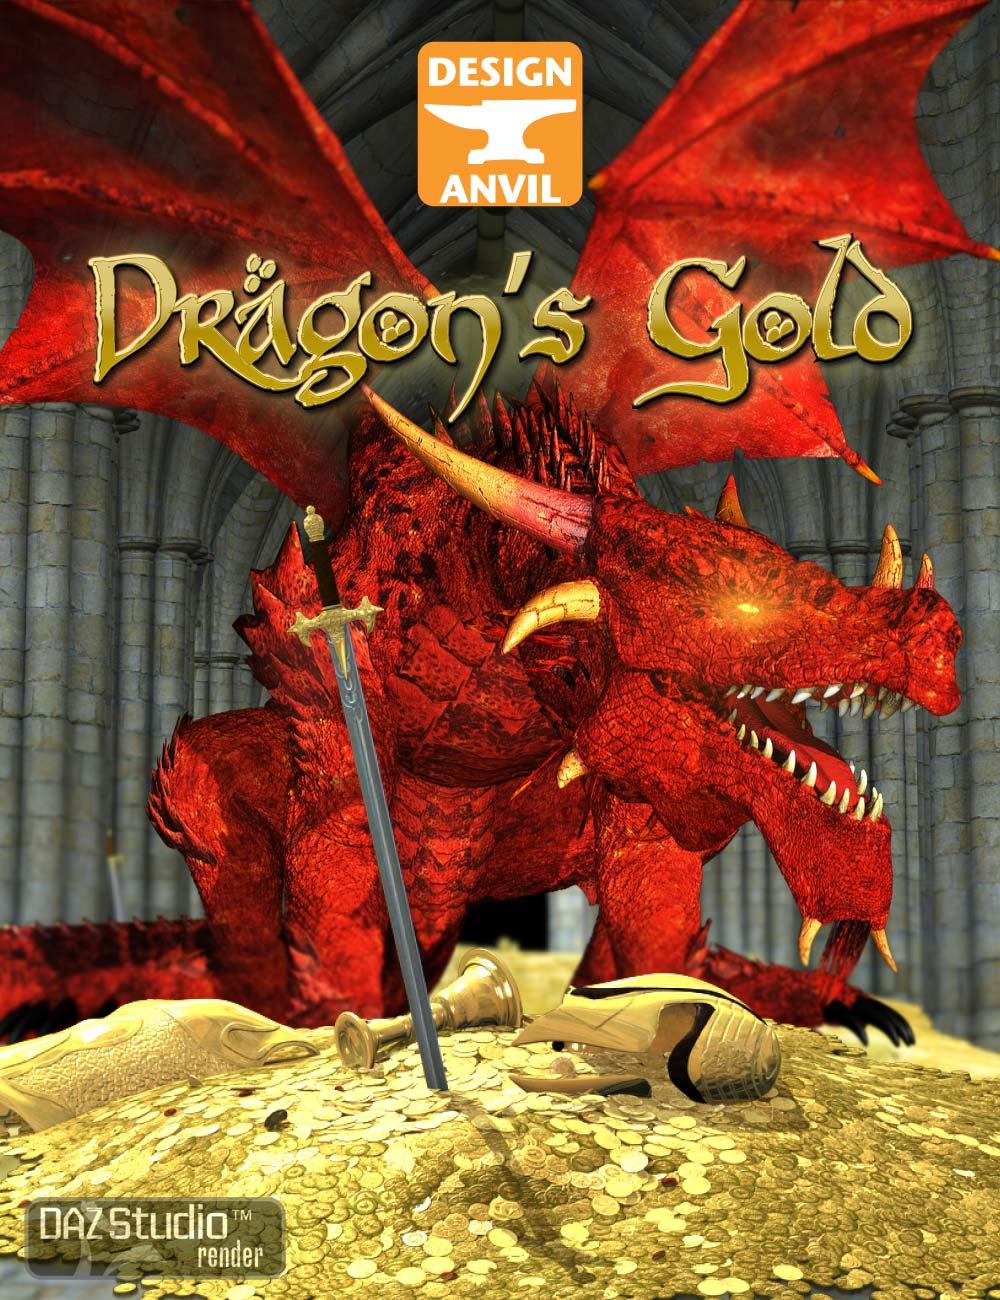 DA Dragon's Gold by: Design Anvil, 3D Models by Daz 3D